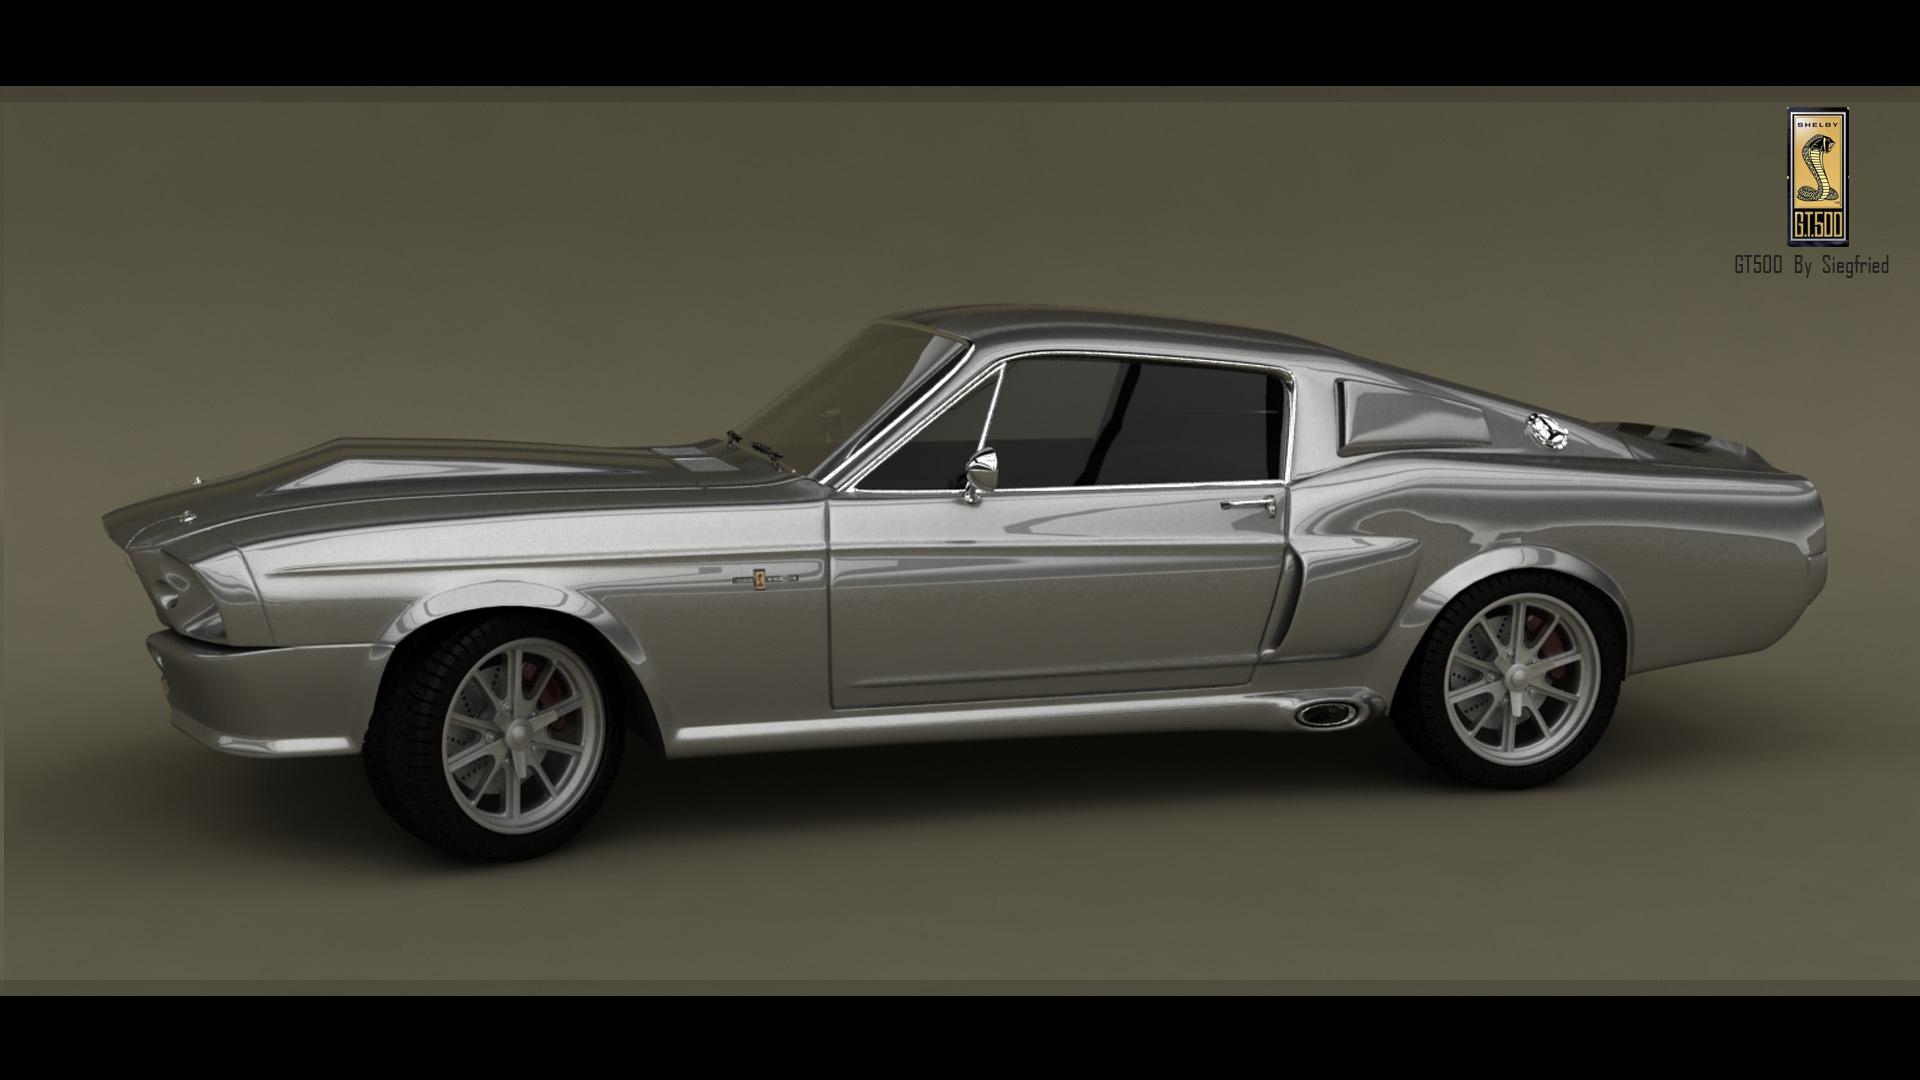 Mustang Shelby GT 500 1967 render2 by Siegfried-Ukr on DeviantArt